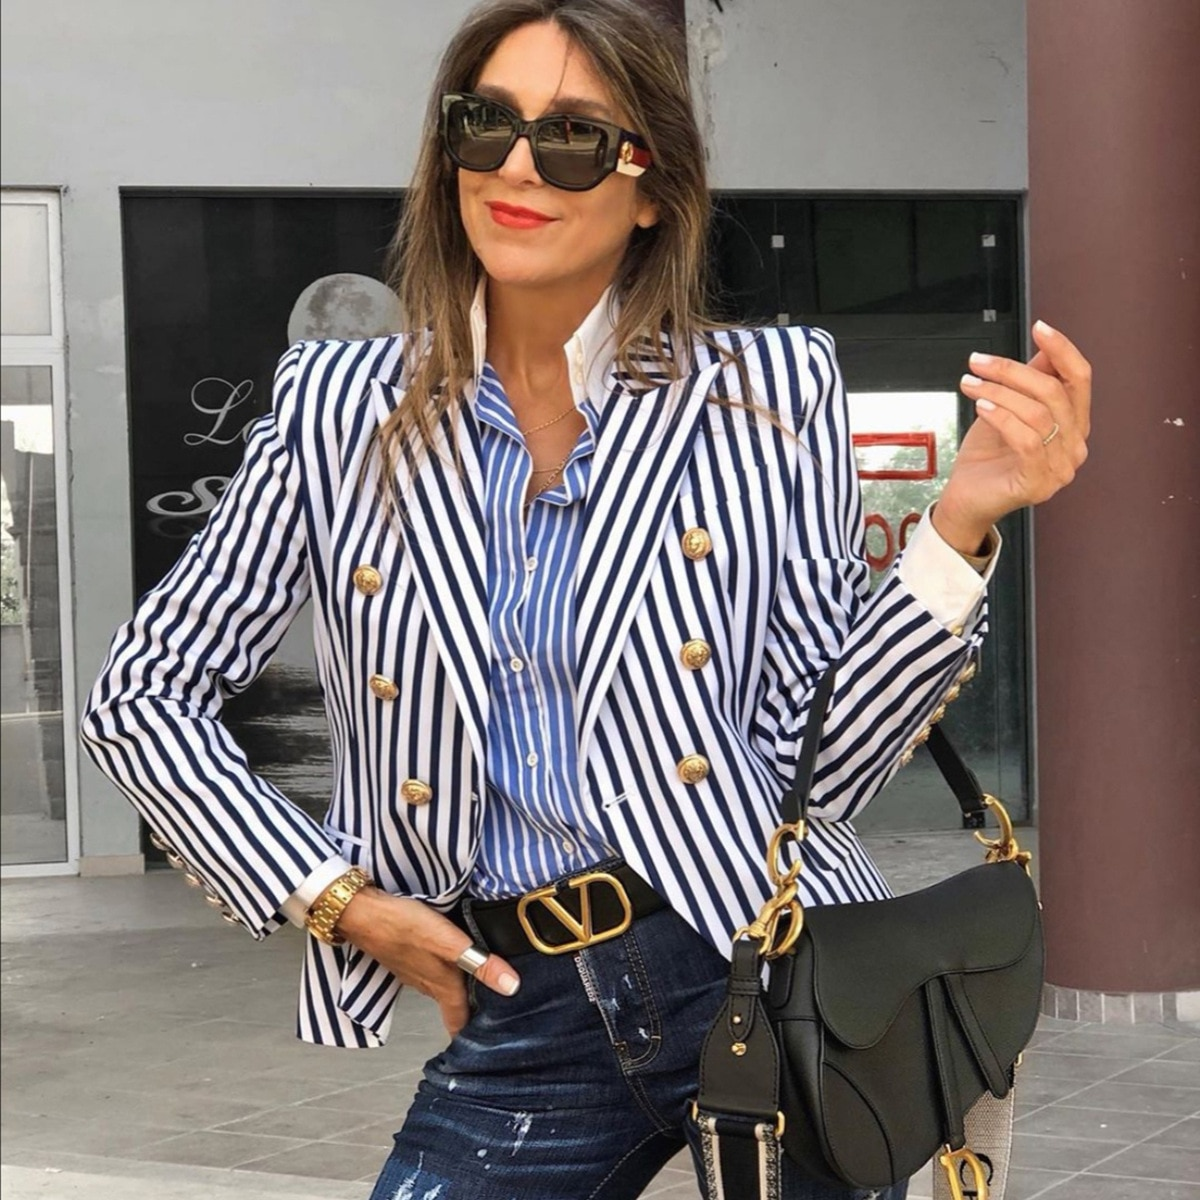 KALENMOS Coat Female Long Sleeve Stripe Blazers Abrigos Jacket Autumn 2021 Clothes for Slim Women Elegant Office Work Coats